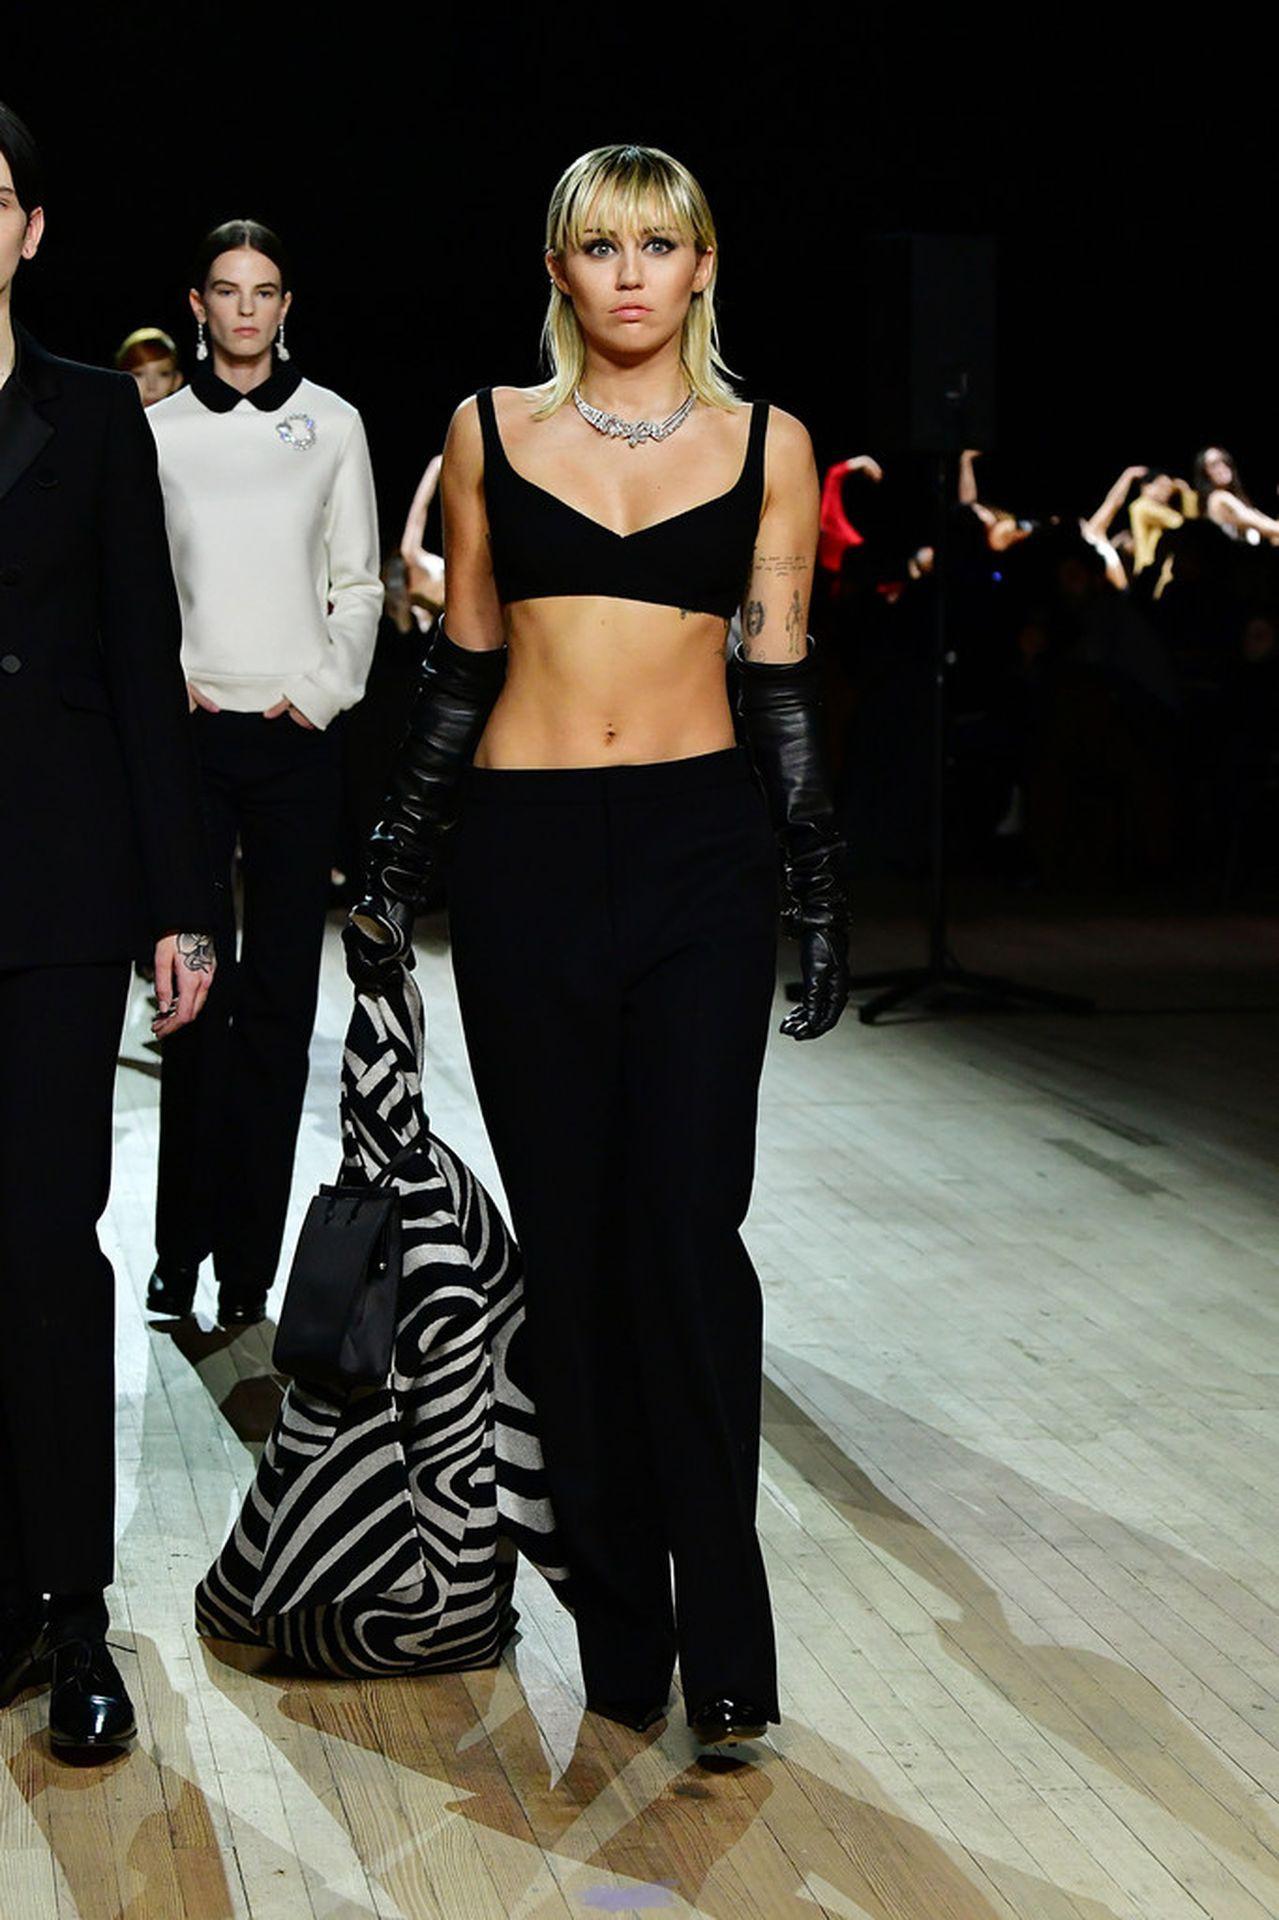 Miley Cyrus Black Bra